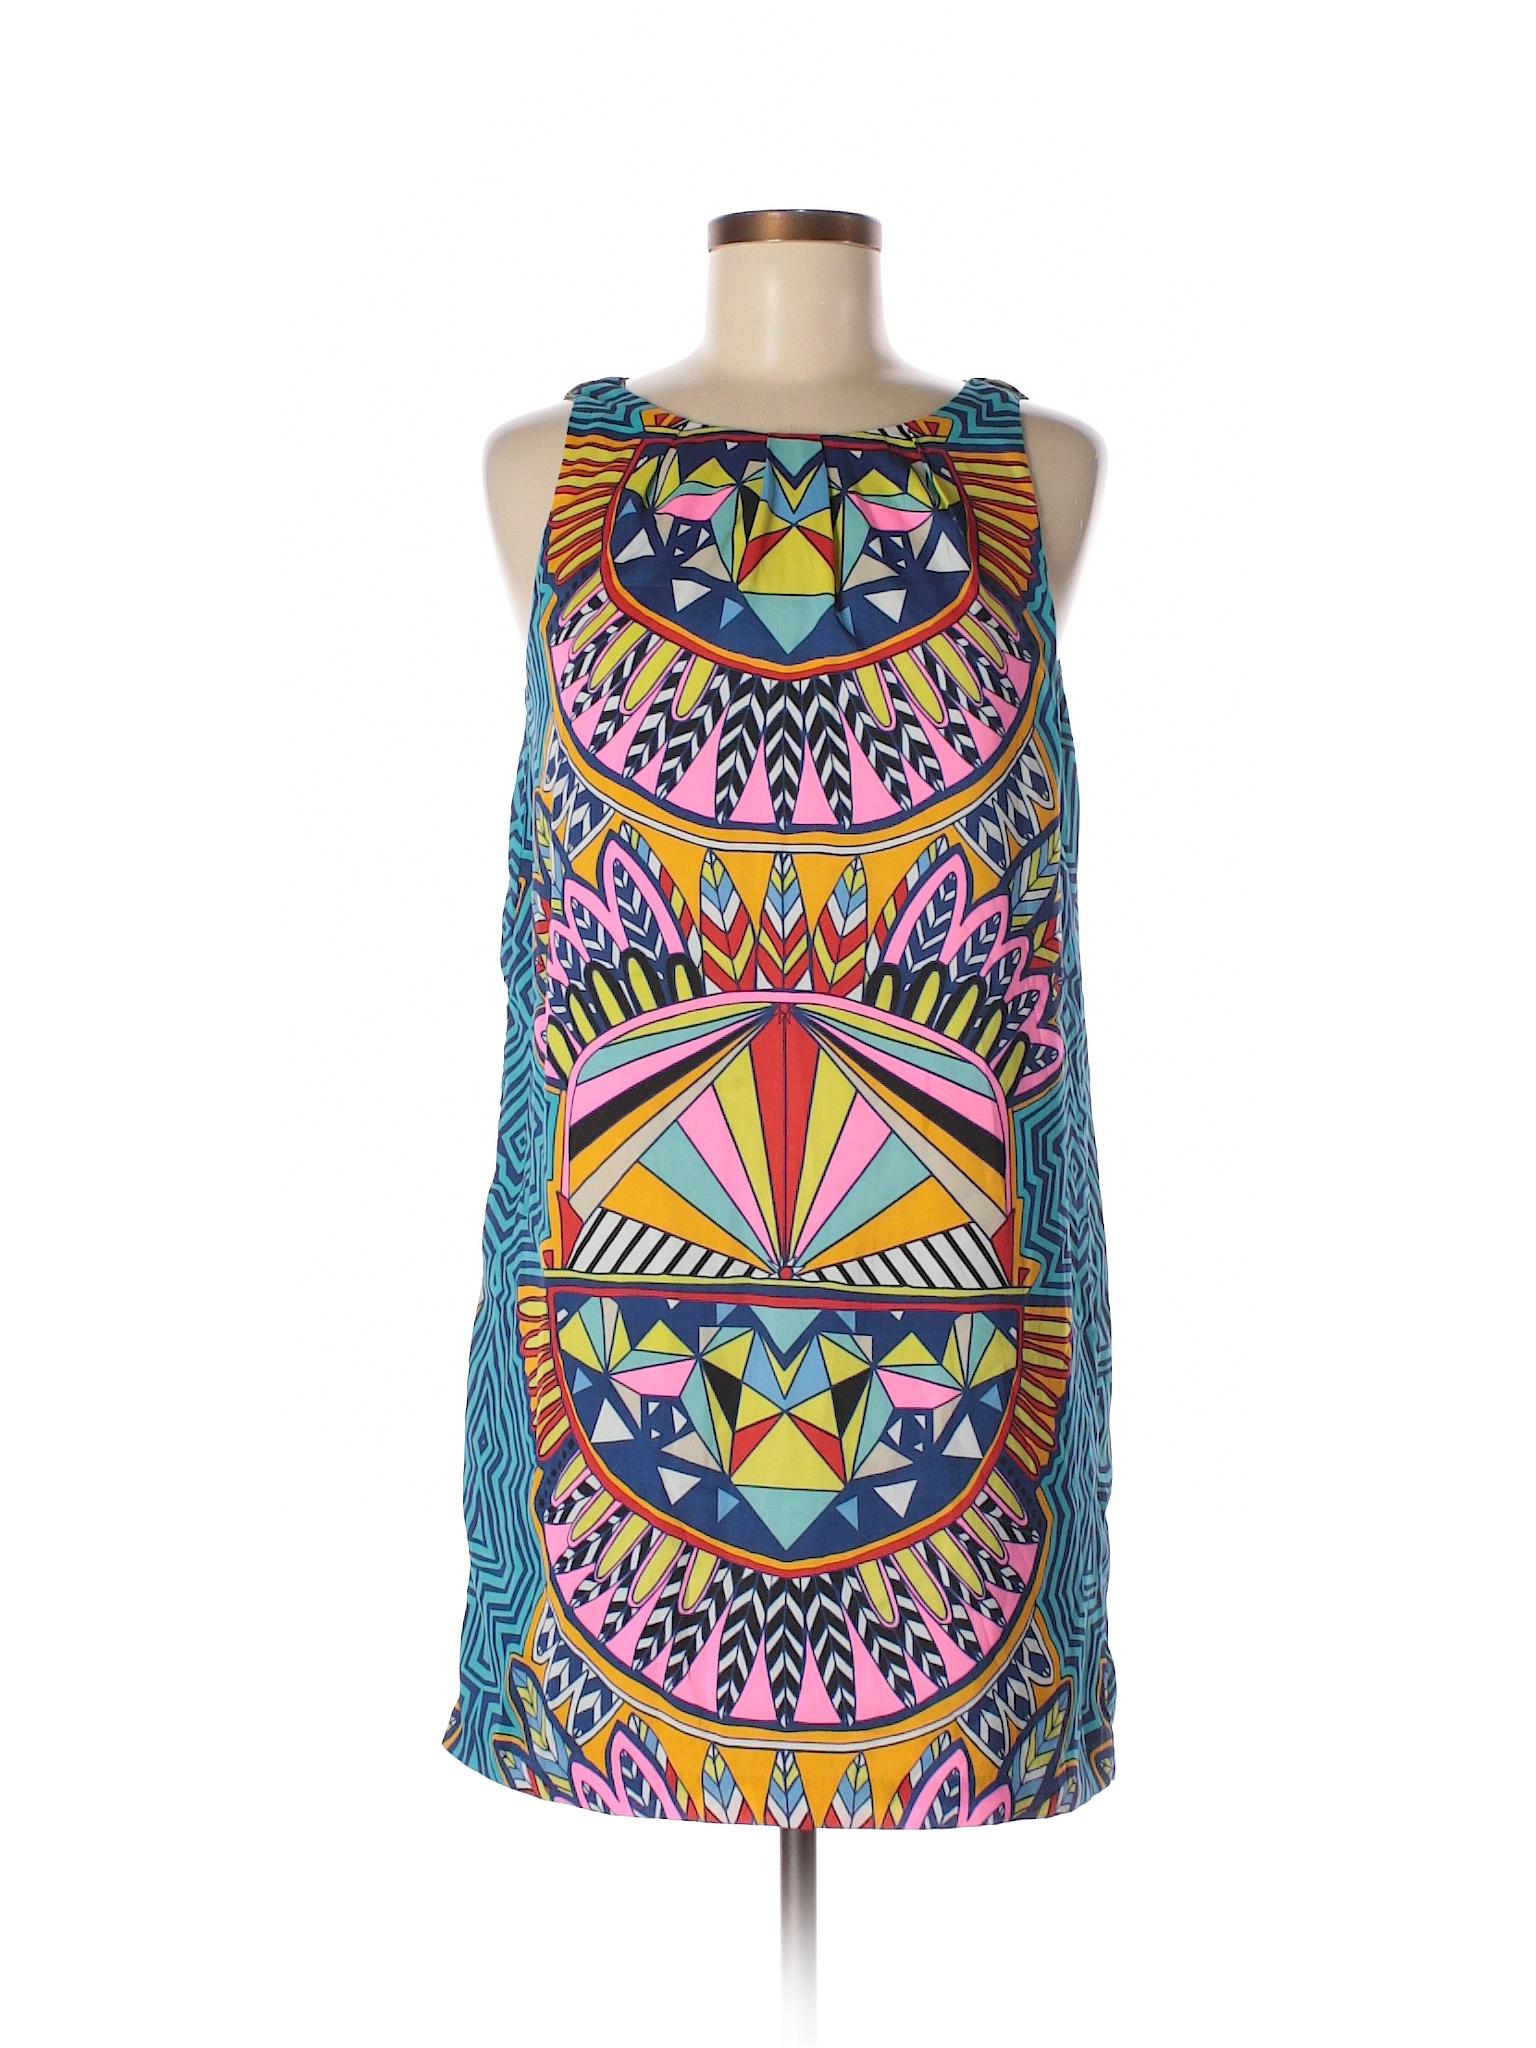 Dress Hoffman Dress Selling Selling Mara Hoffman Mara Casual Casual Selling Hoffman Casual Mara TSqwaAFx